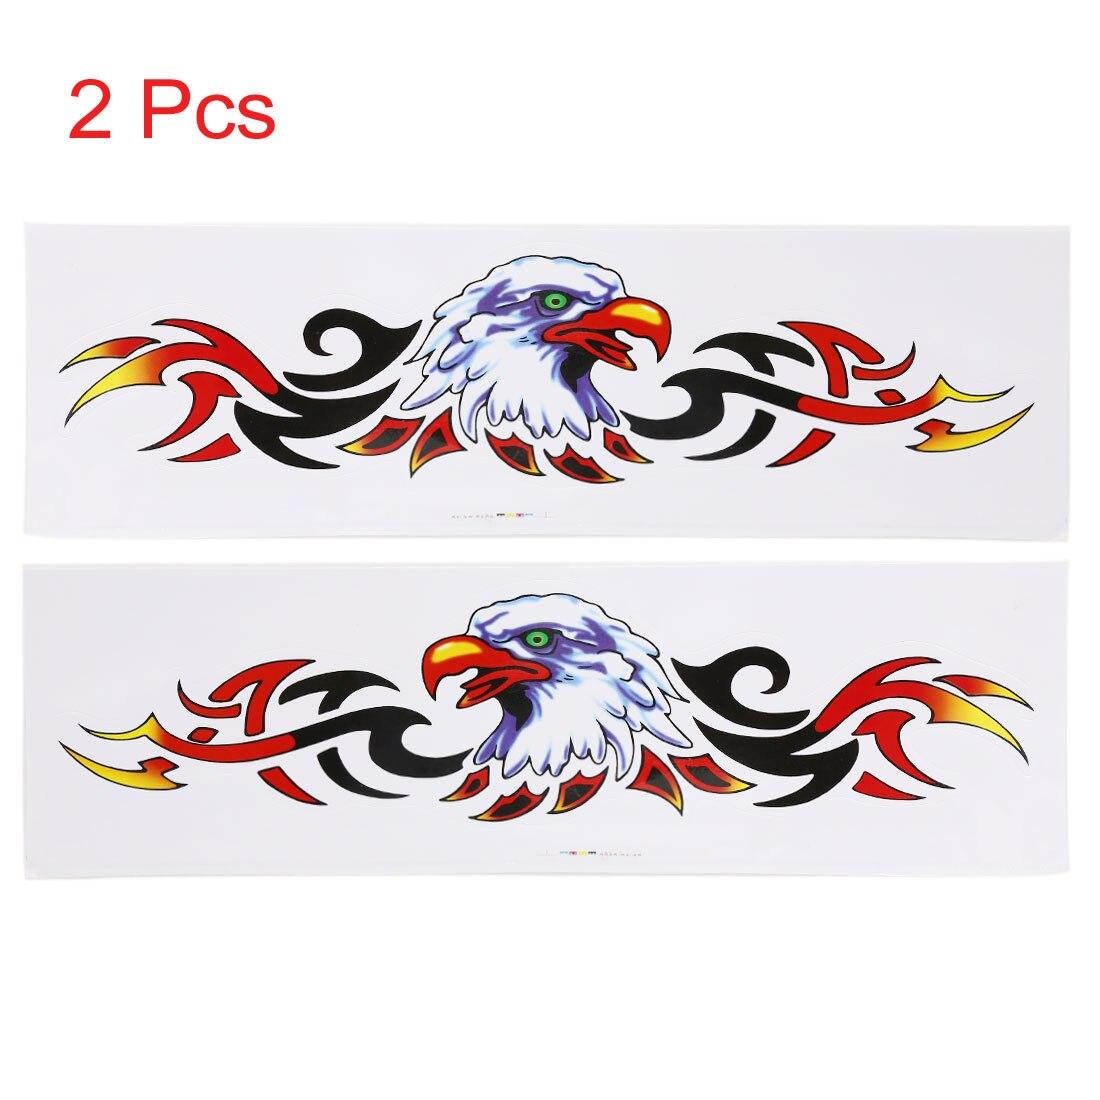 Car sticker eagle - X Autohaux 2pcs Eagle Head Fire Flame Adhesive Car Exterior Sticker Decor Auto Decal China